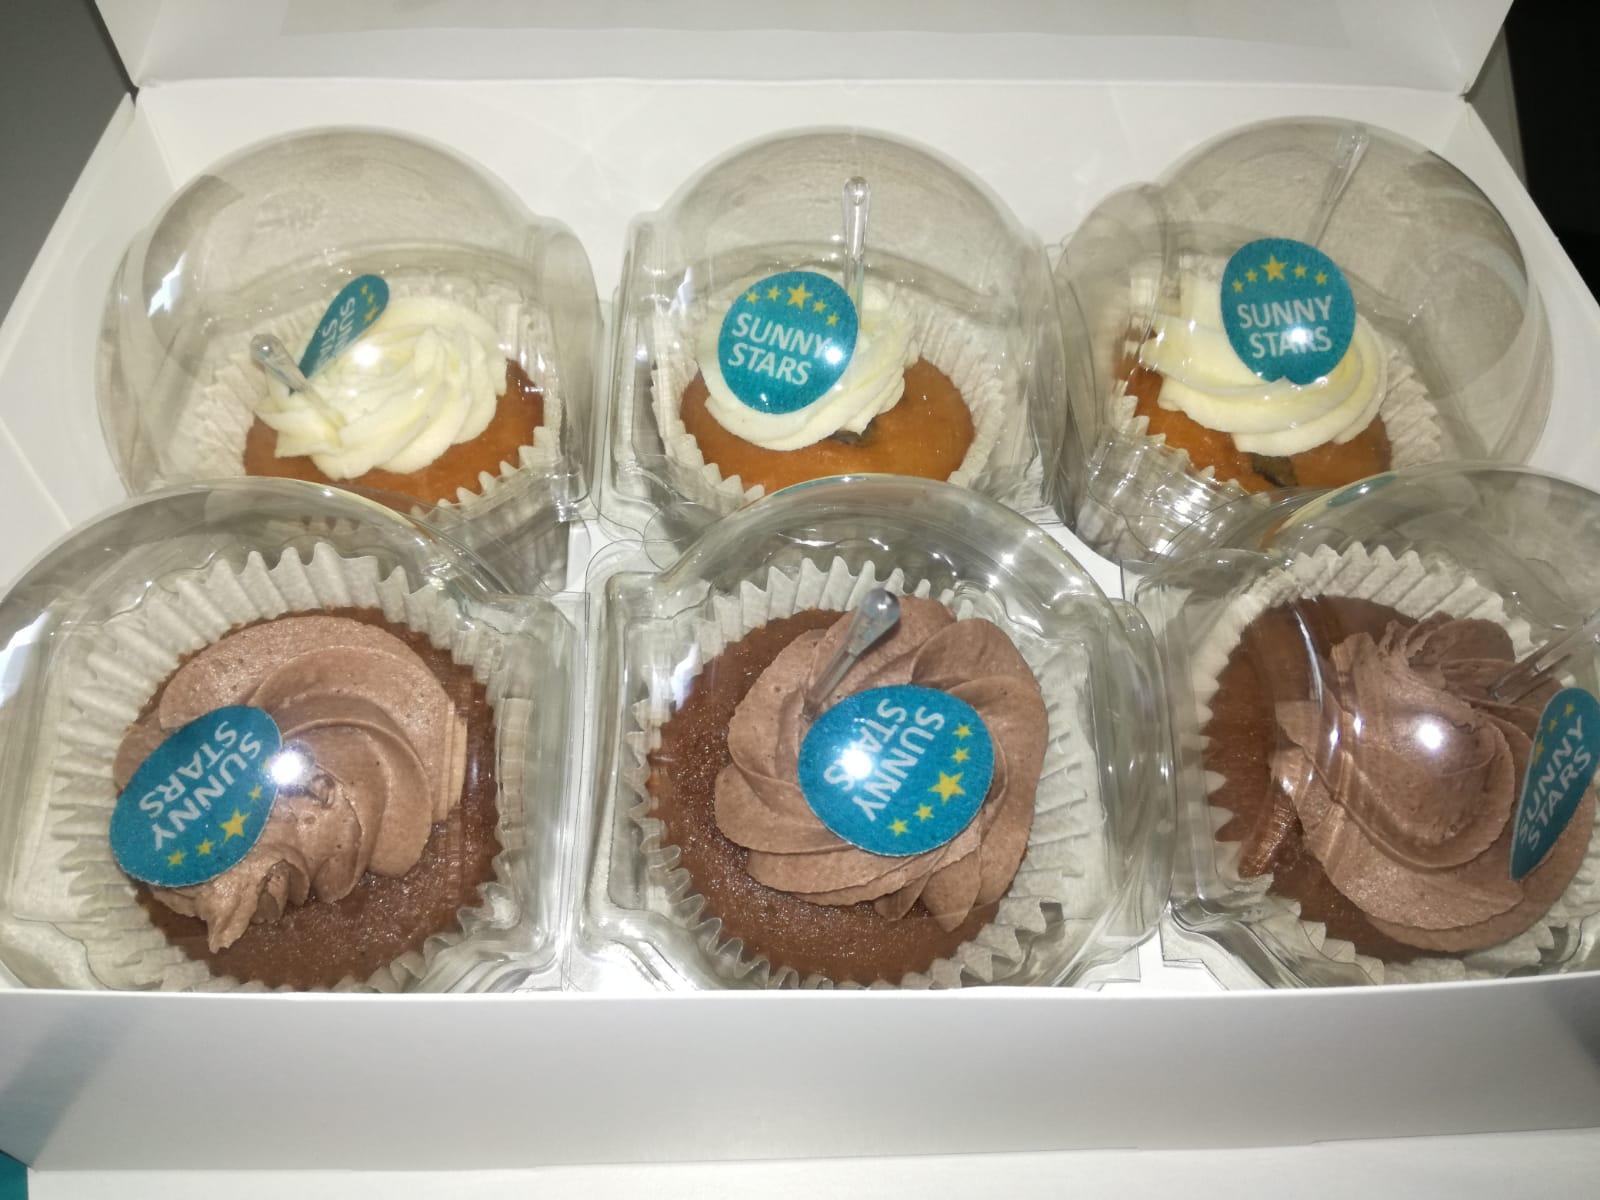 Sunny Stars Belohnung Cupcakes 1